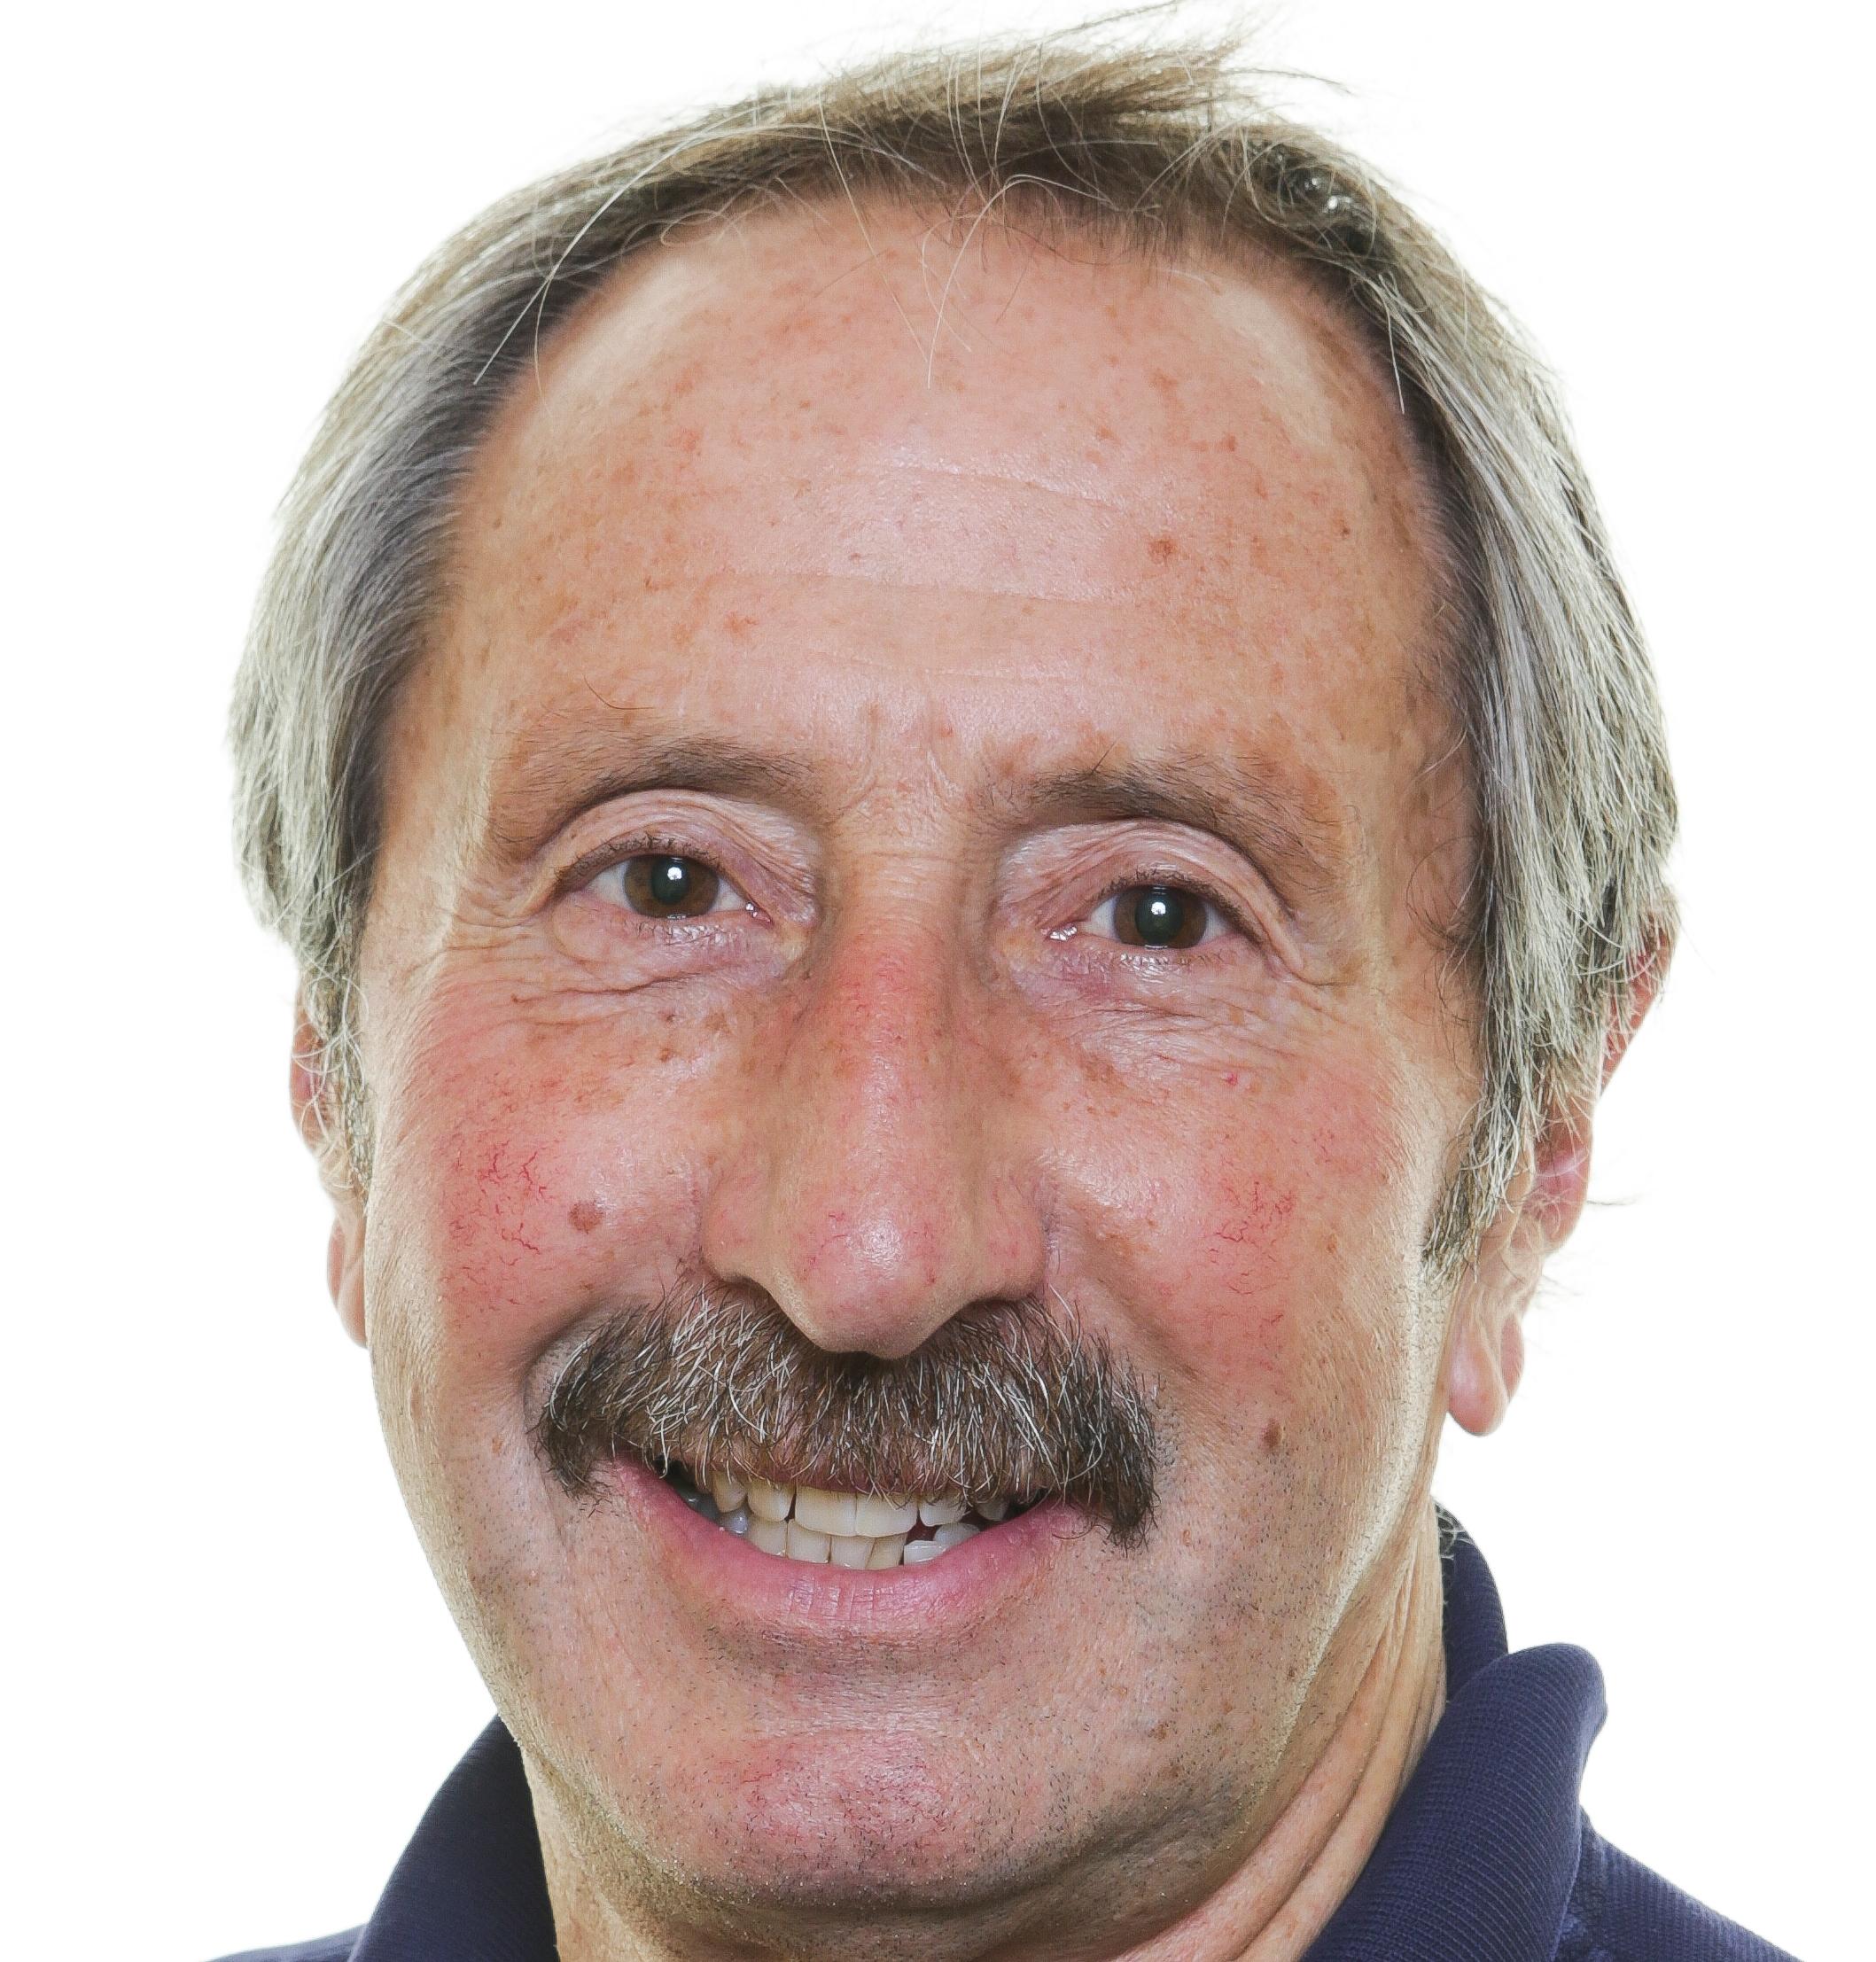 Paul Handley, North Ward: Conservative